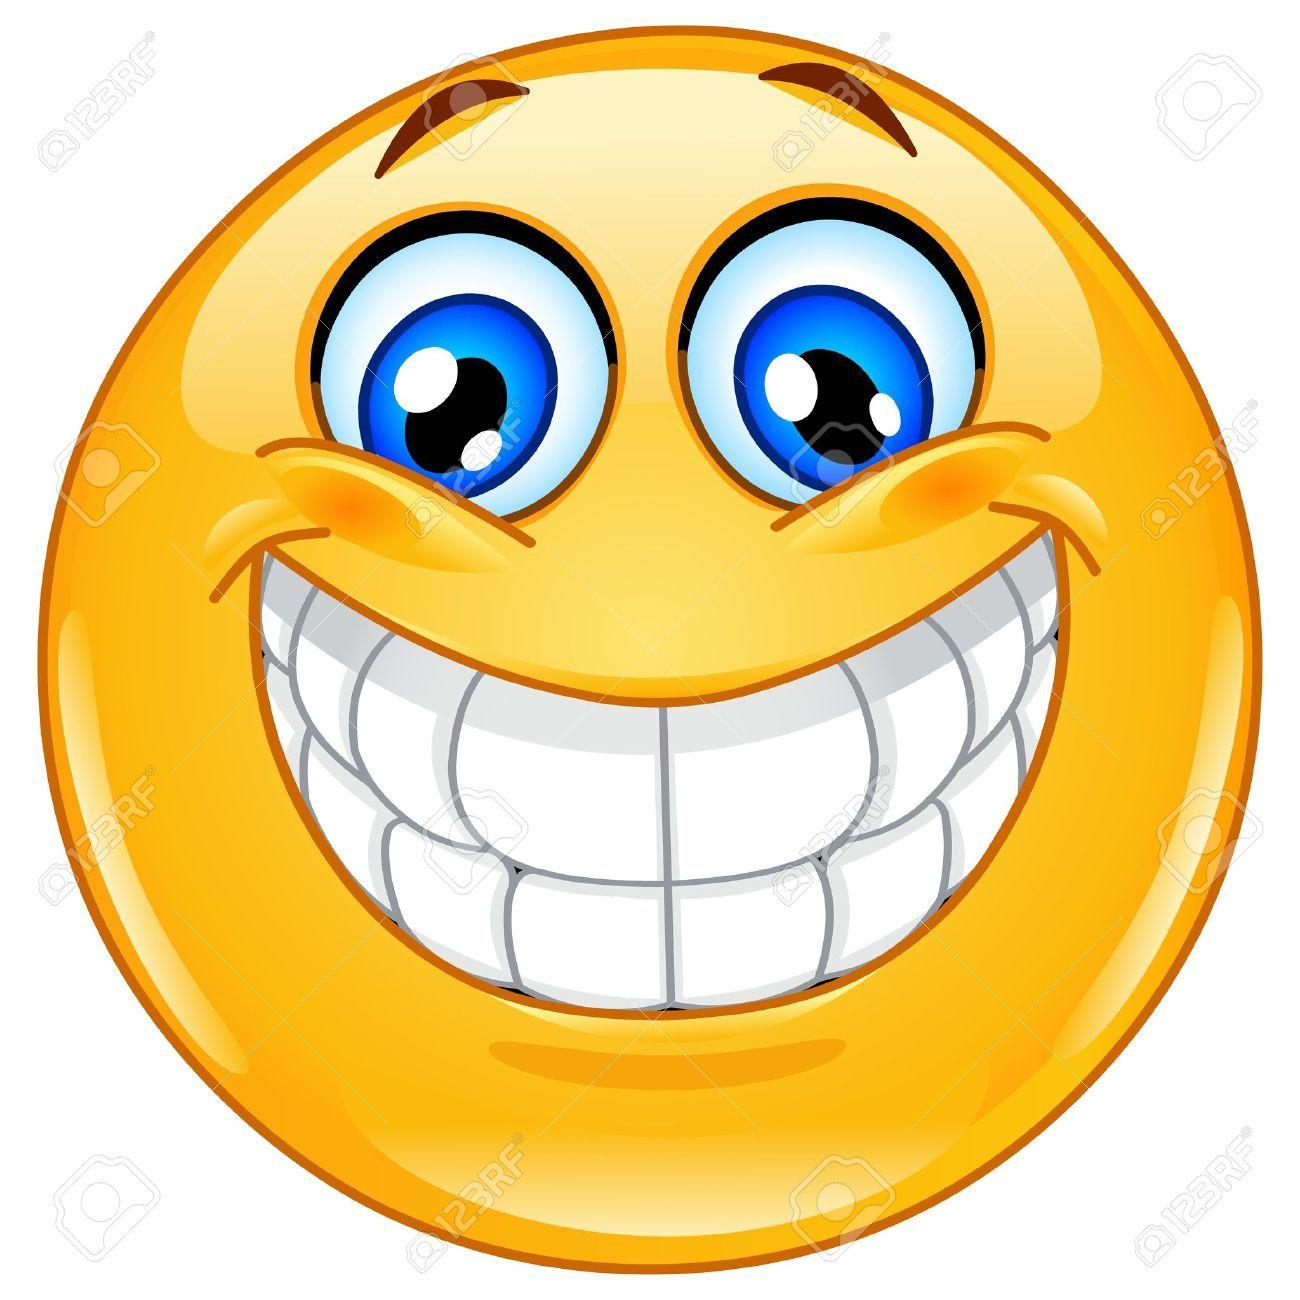 Smiles clipart 2 » Clipart Portal.